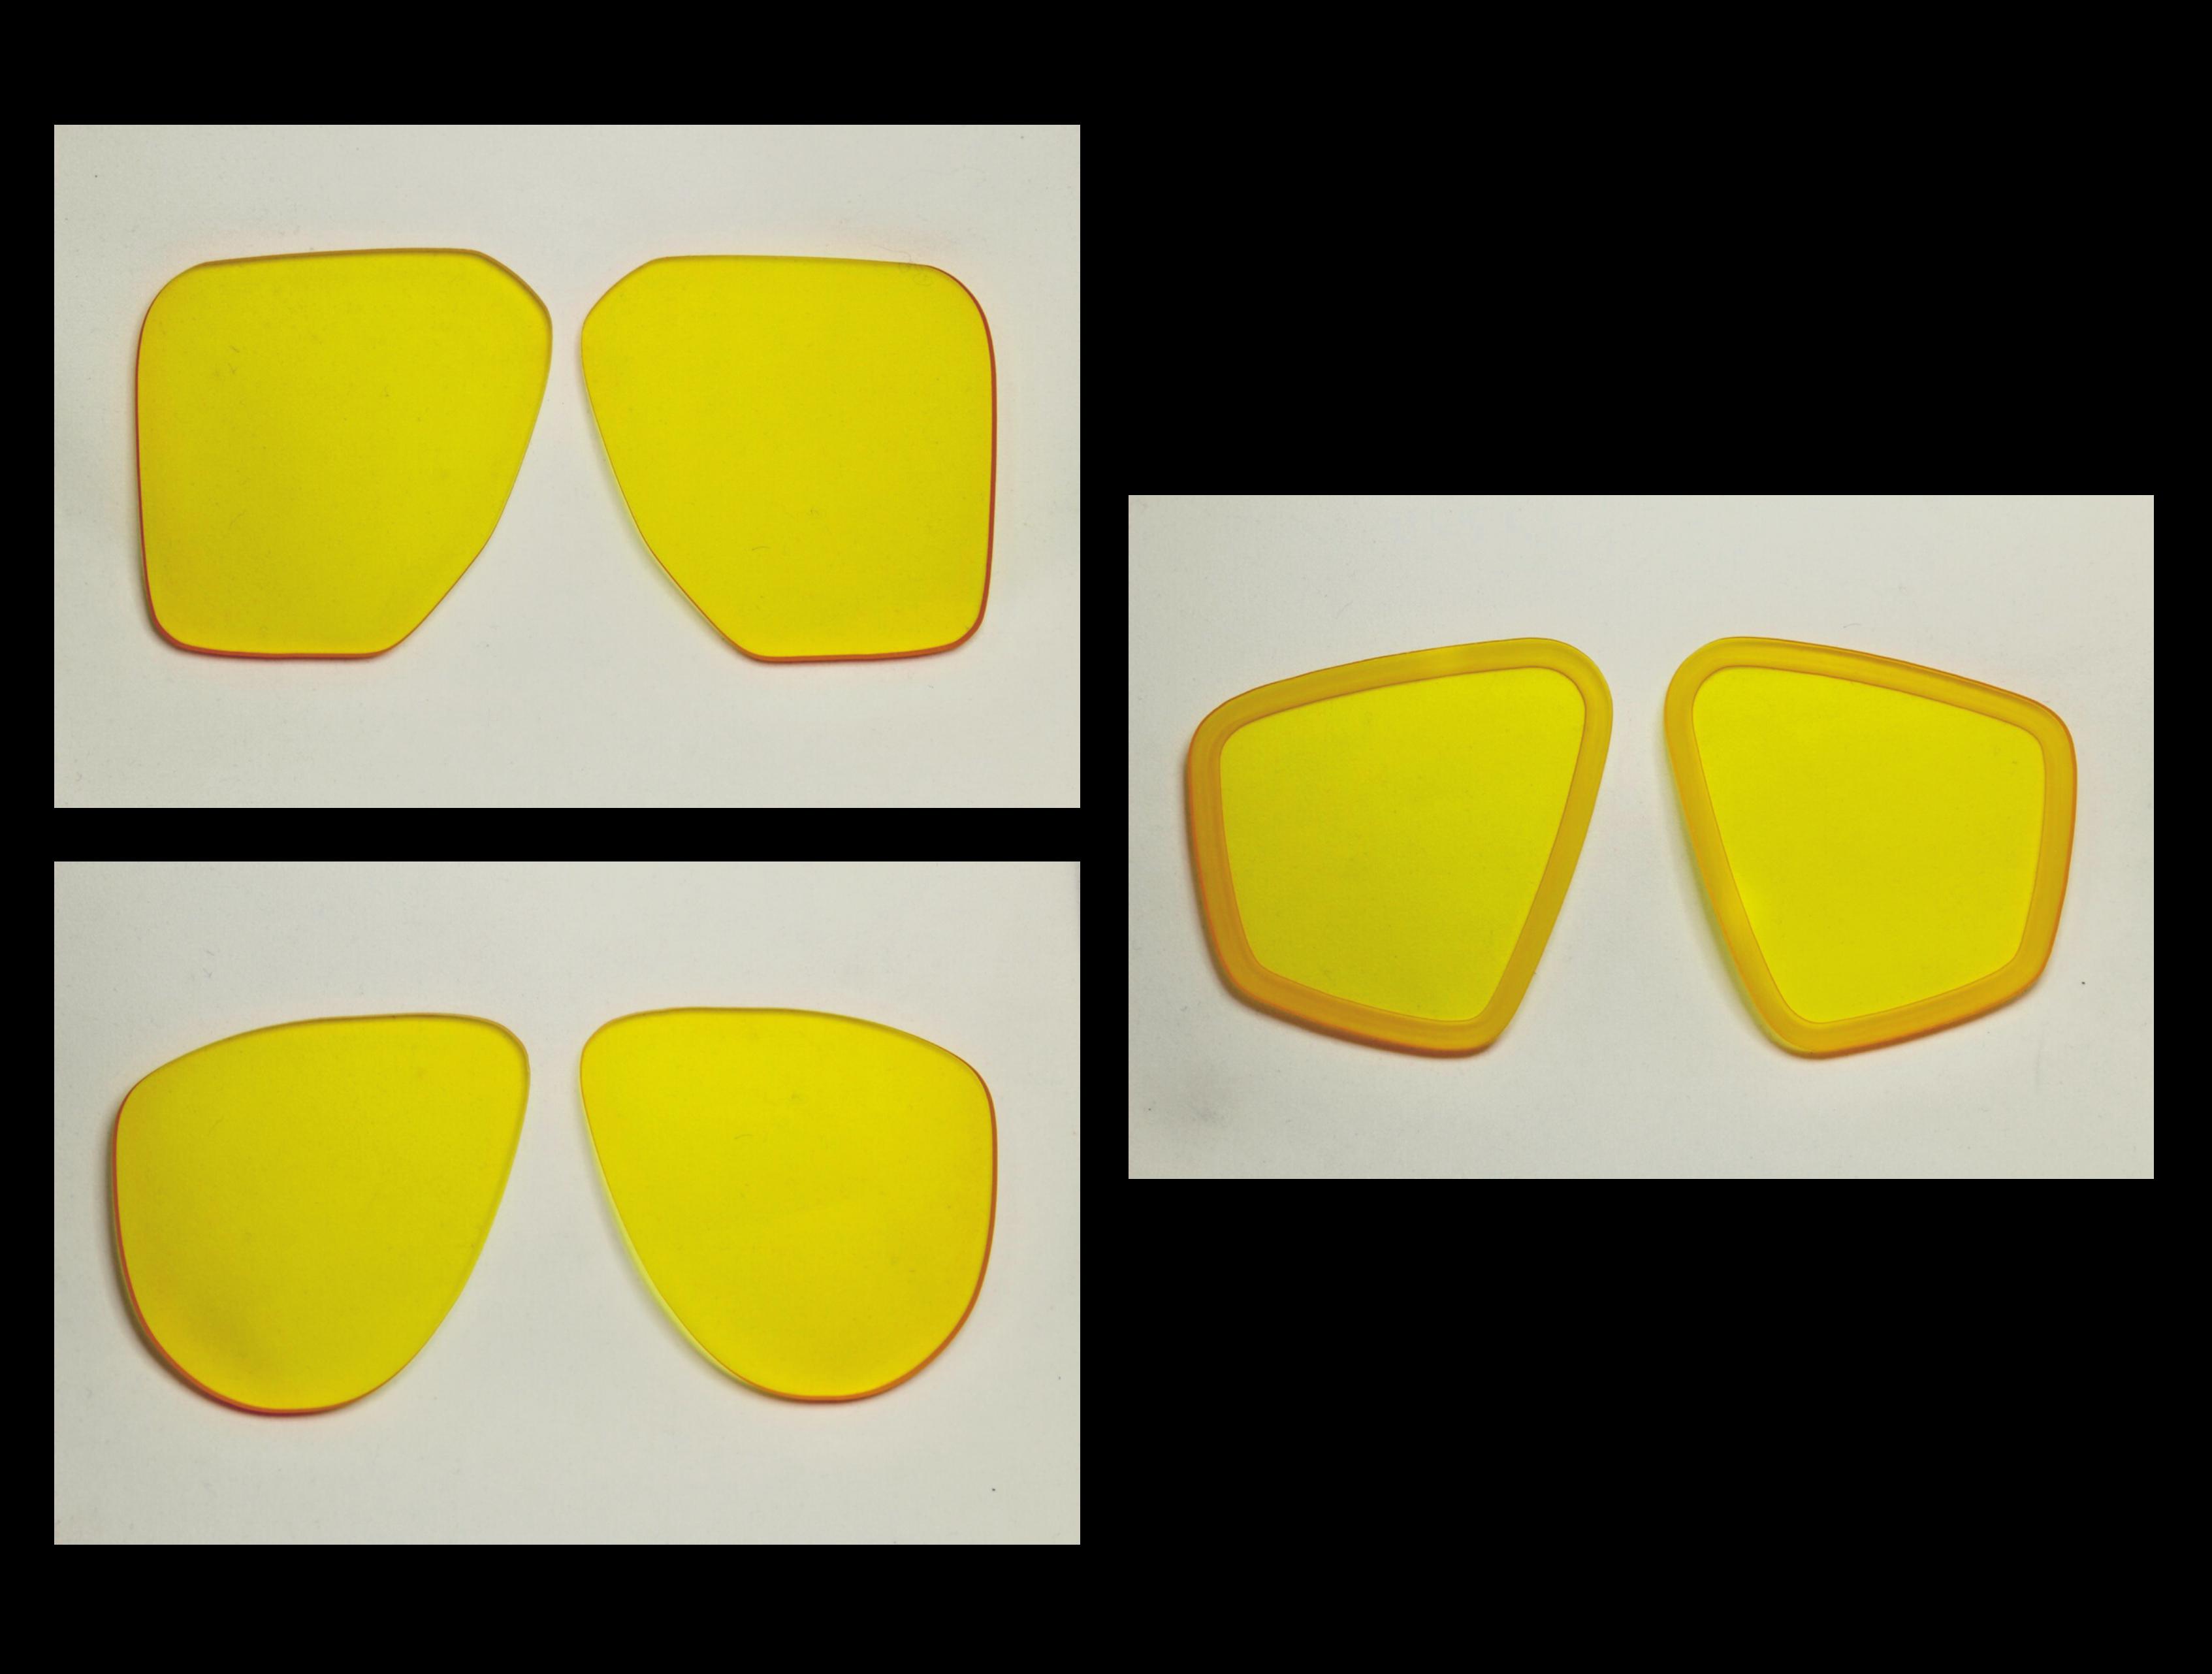 SeaVision MaxVision Lenses